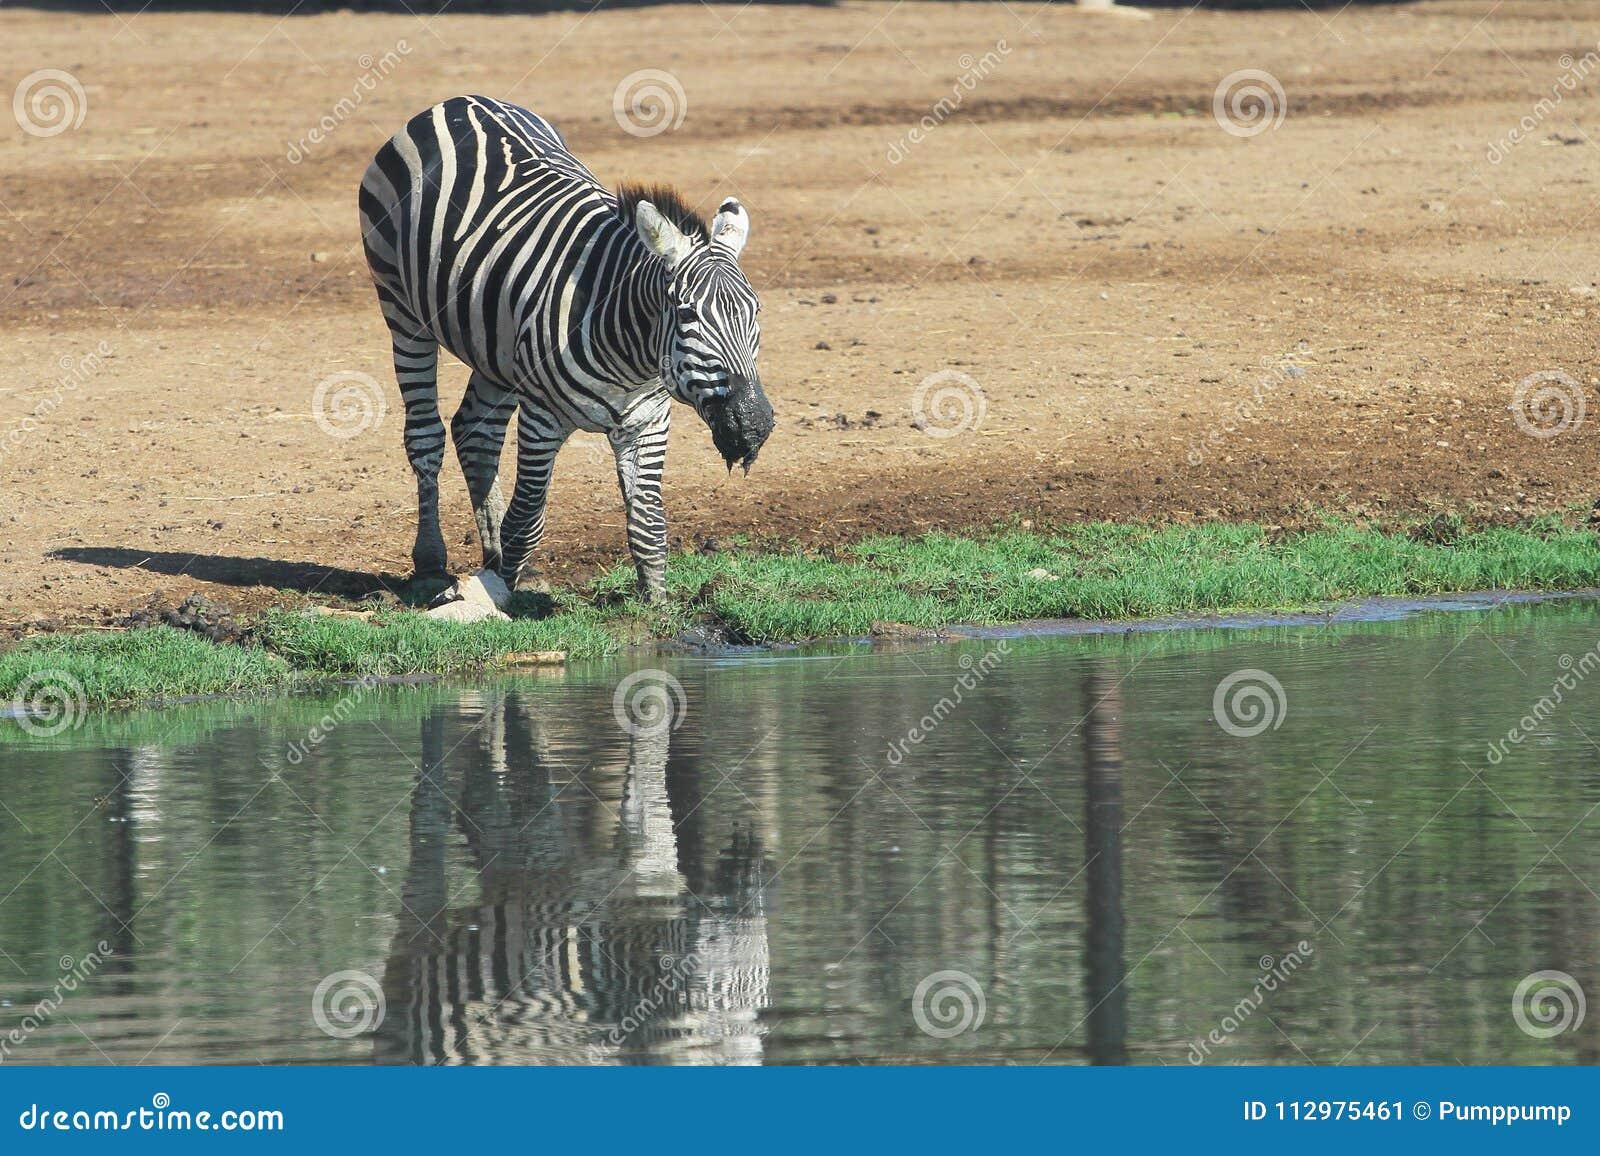 Zebra eat water near river